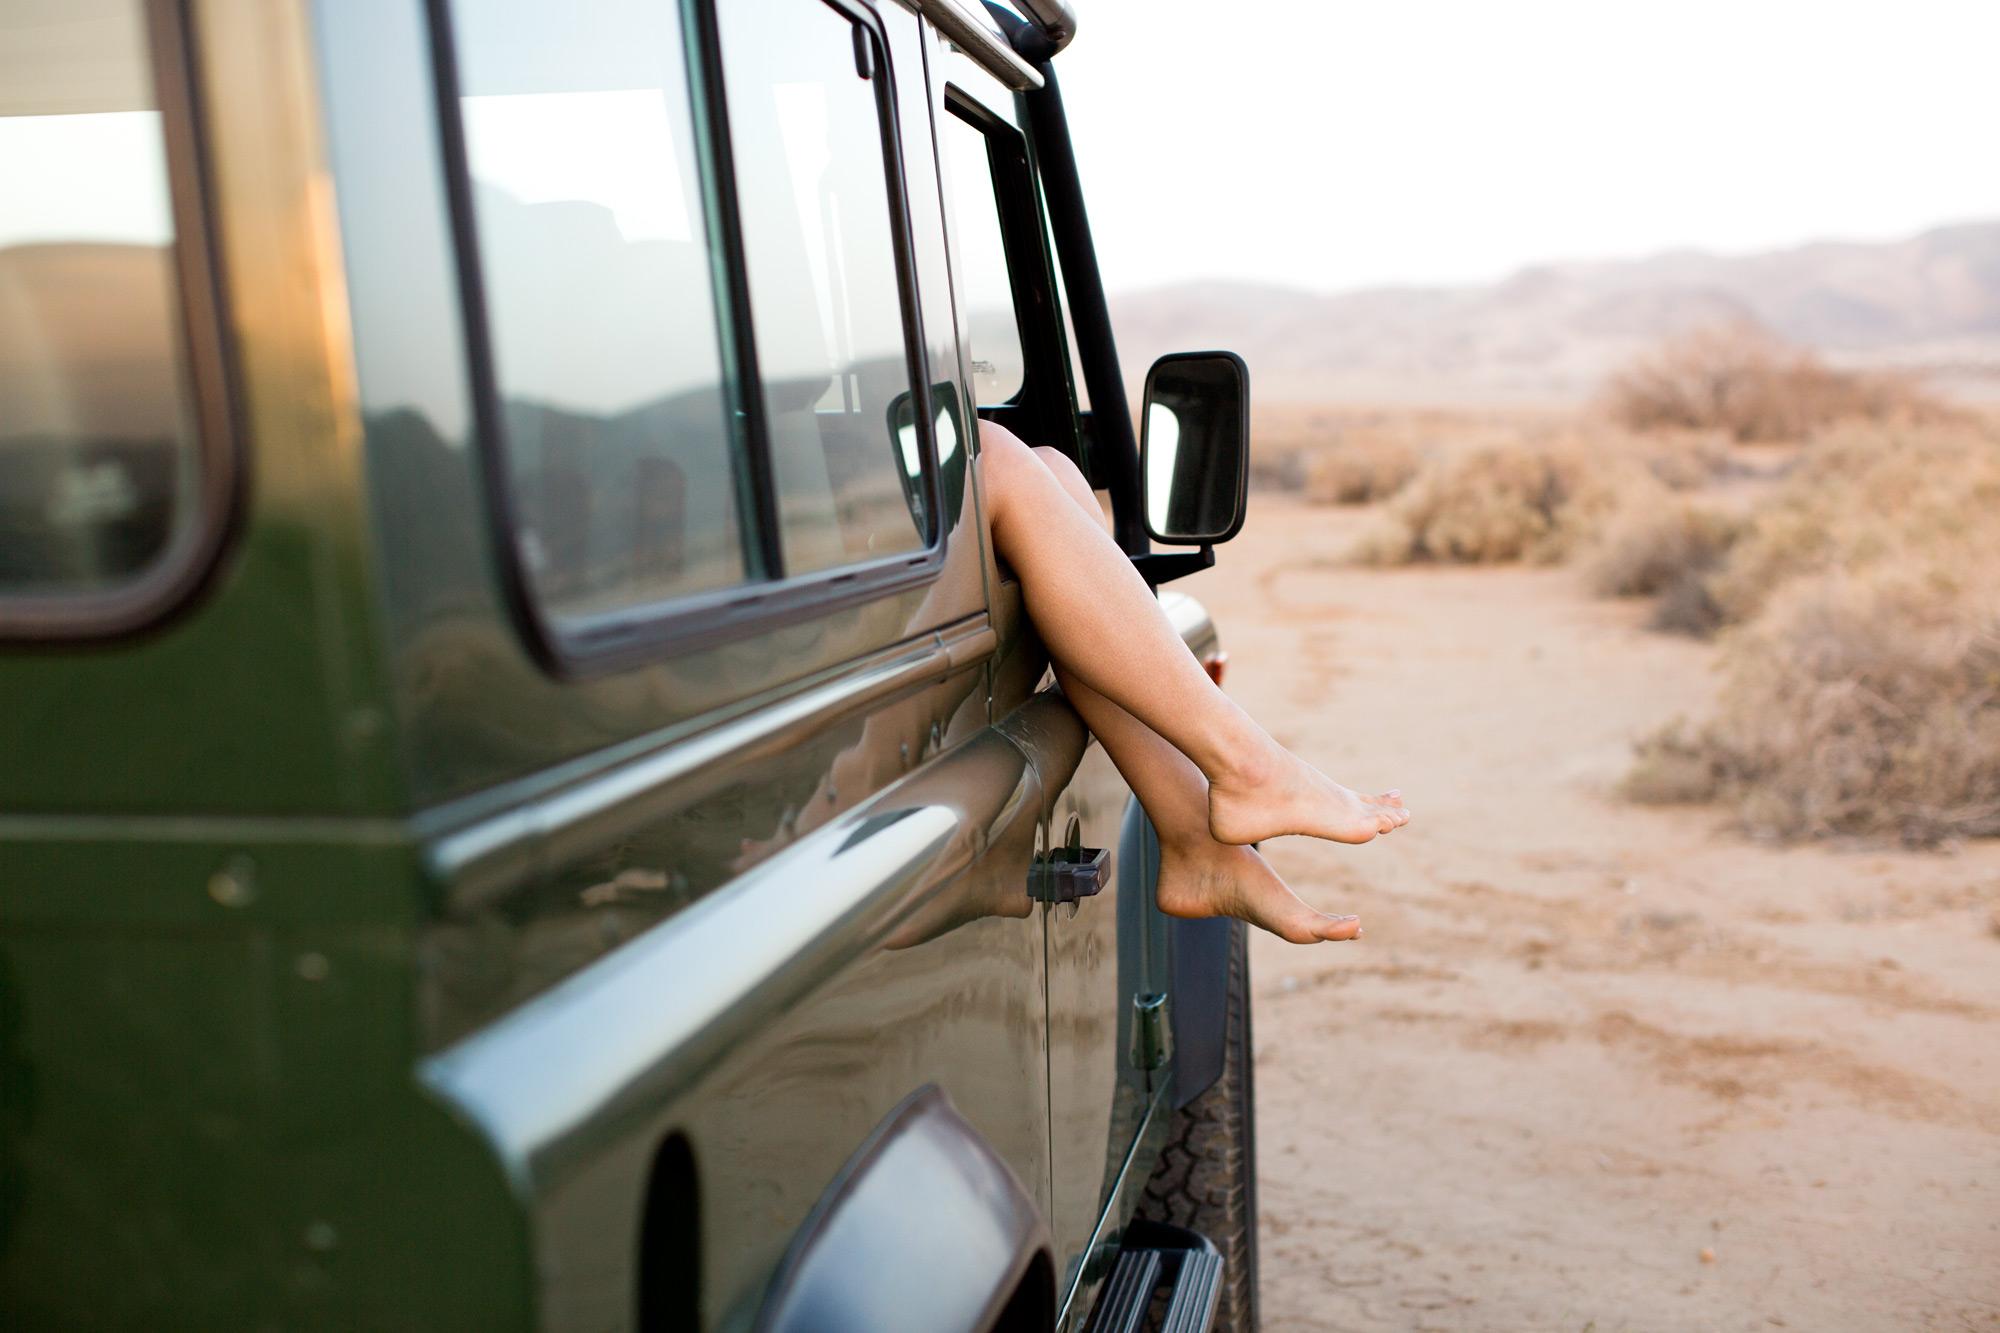 automotive-lifestyle-defender-lou-mora-010.jpg